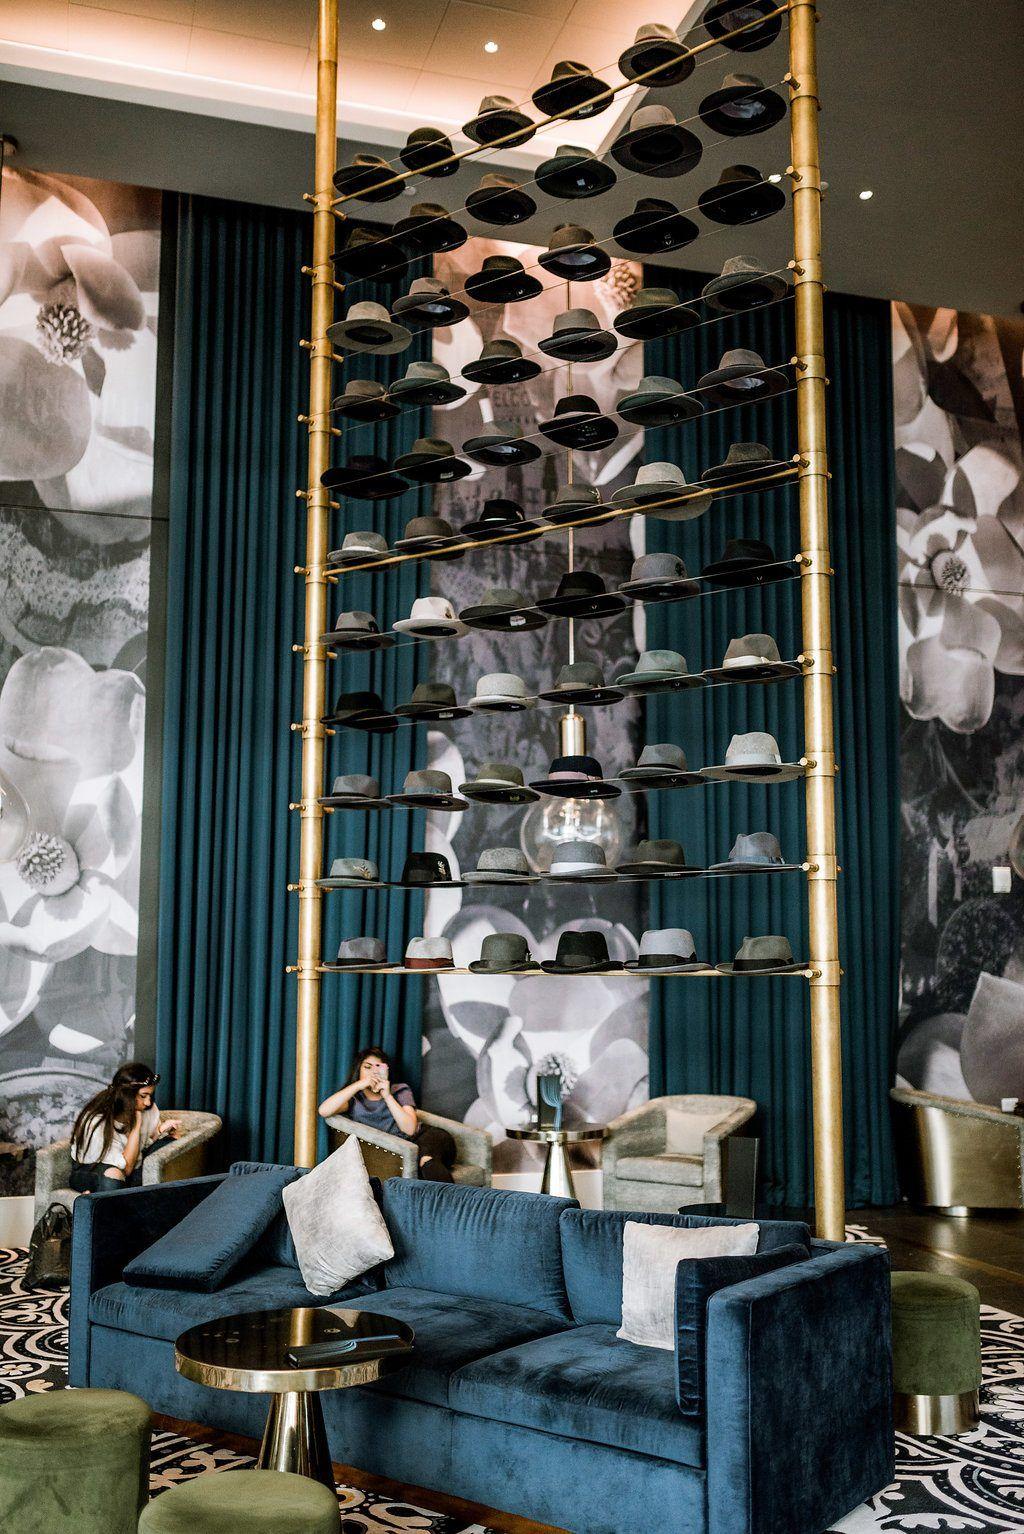 A Weekend Downtown Elle Apparel By Leanne Barlow Hba Design Luxury Hotels Interior Hotel Interior Design